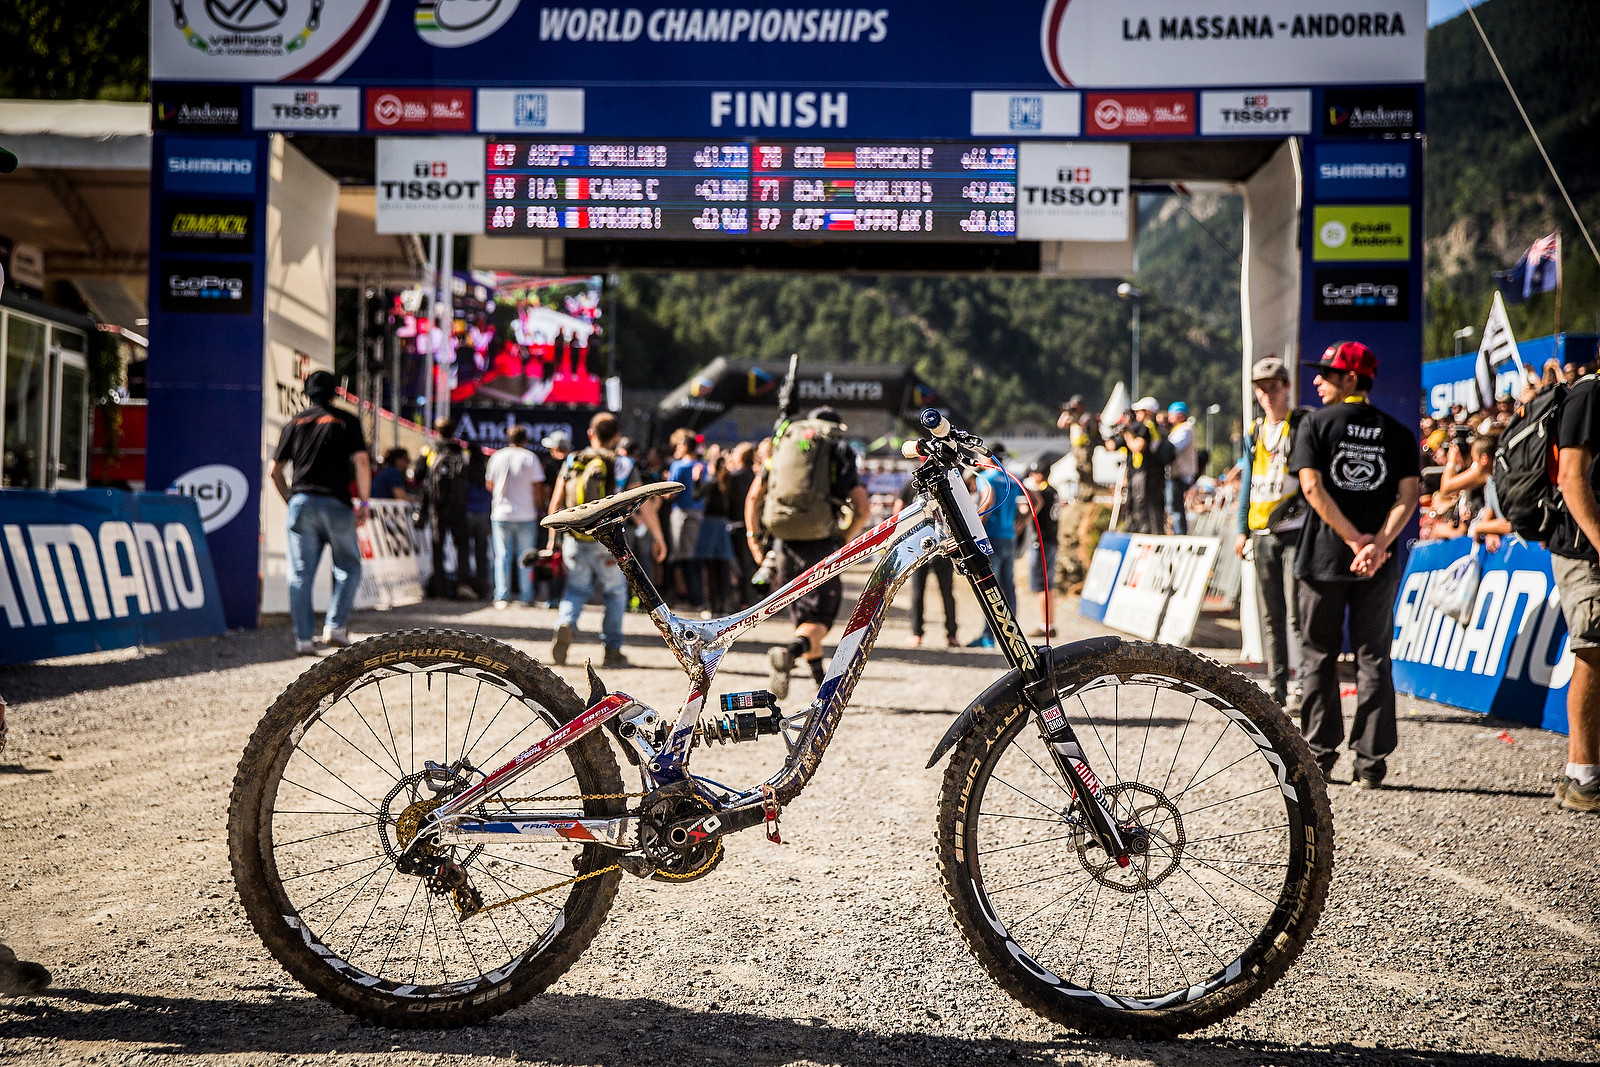 WINNING BIKE: Loic Bruni's Lapierre DH for World Champs - WINNING BIKE: Loic Bruni's Lapierre DH for World Champs - Mountain Biking Pictures - Vital MTB